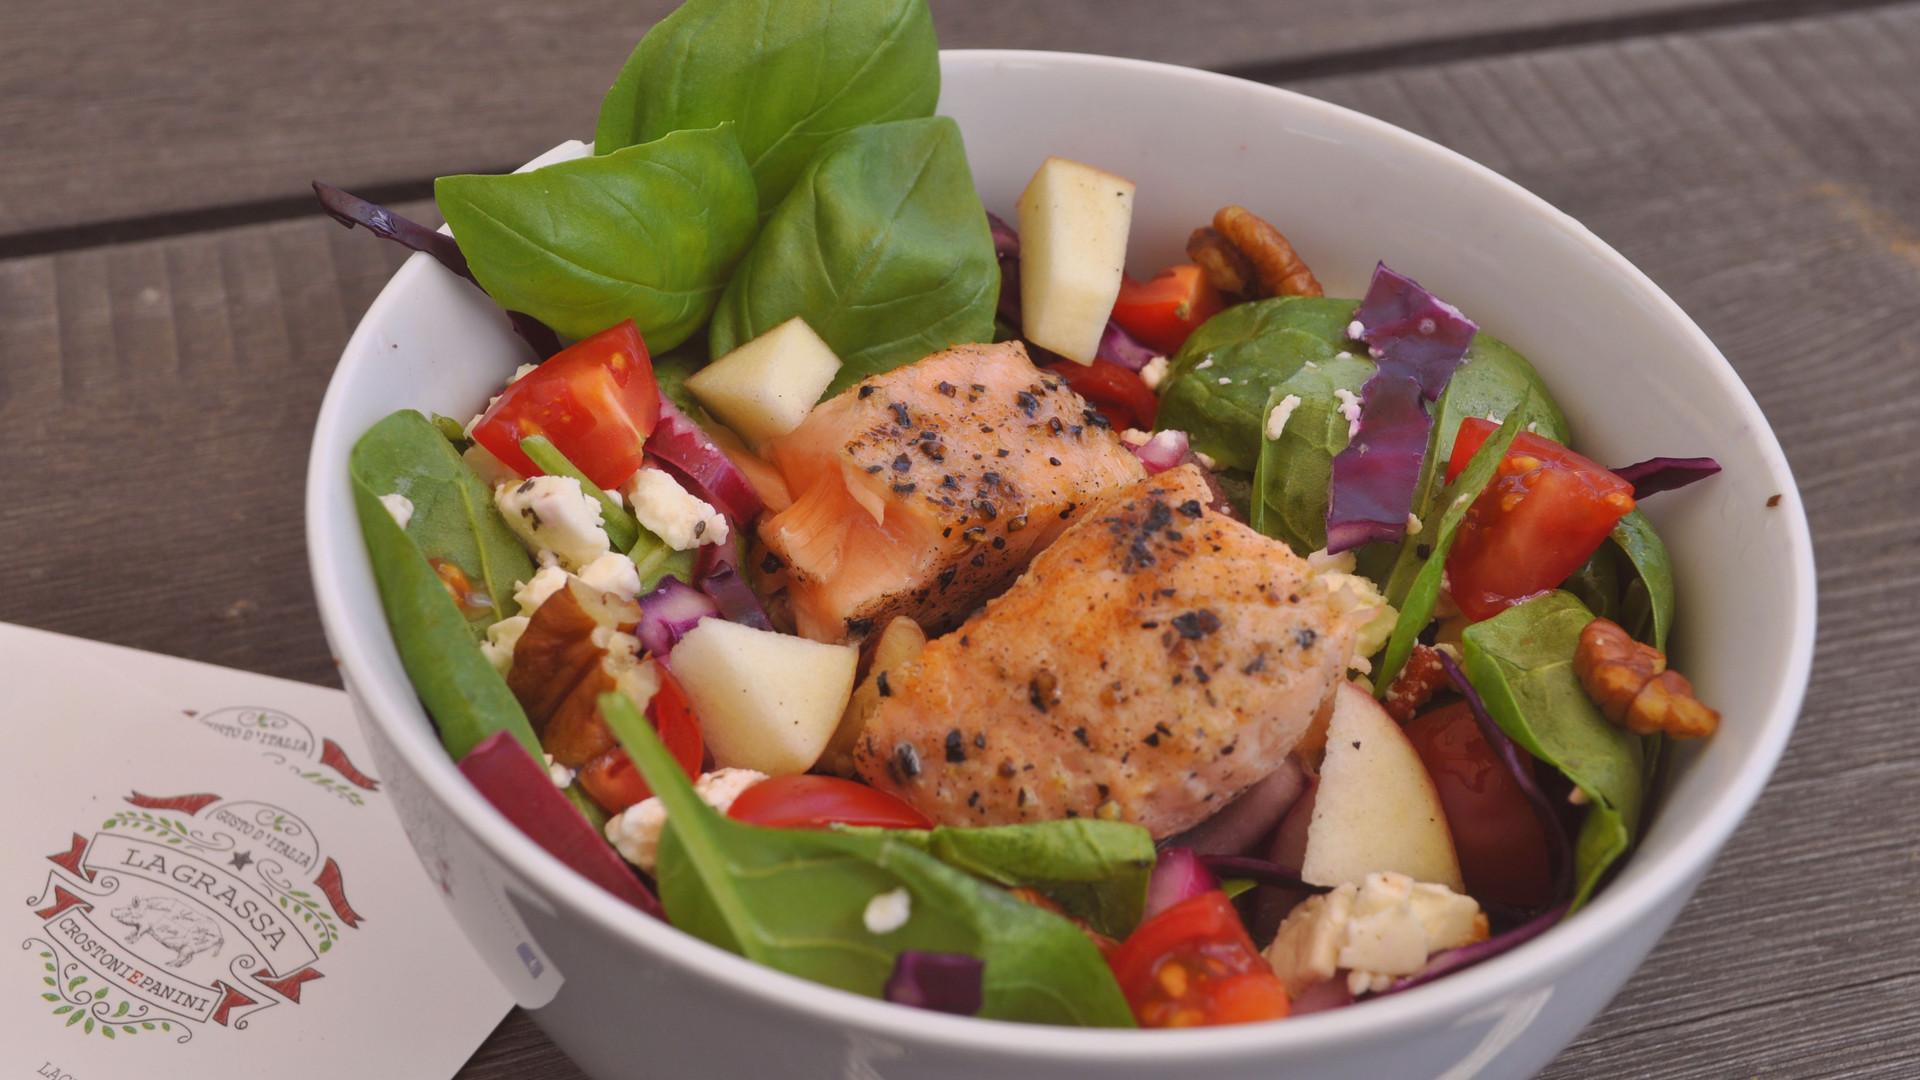 Spinat-Salat Lachs_LaGrassa.jpg